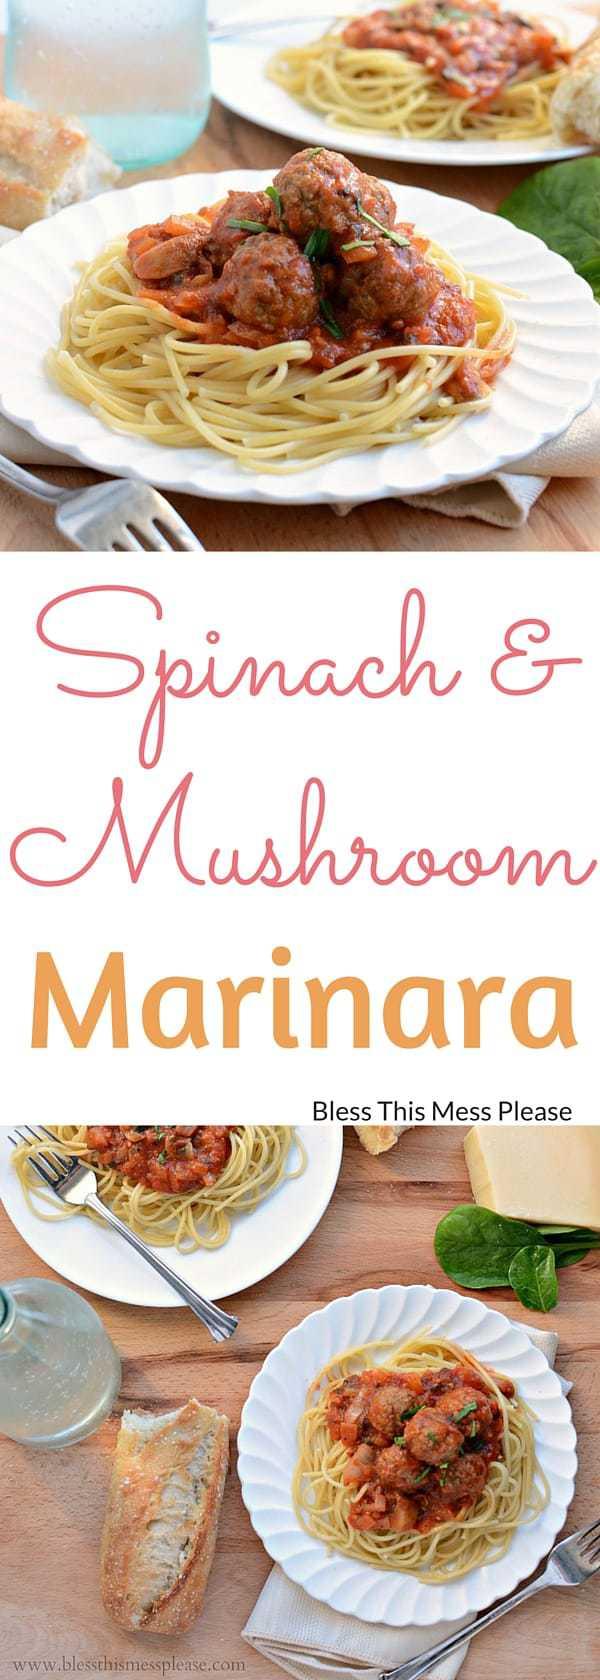 Spinach and Mushroom Marinara